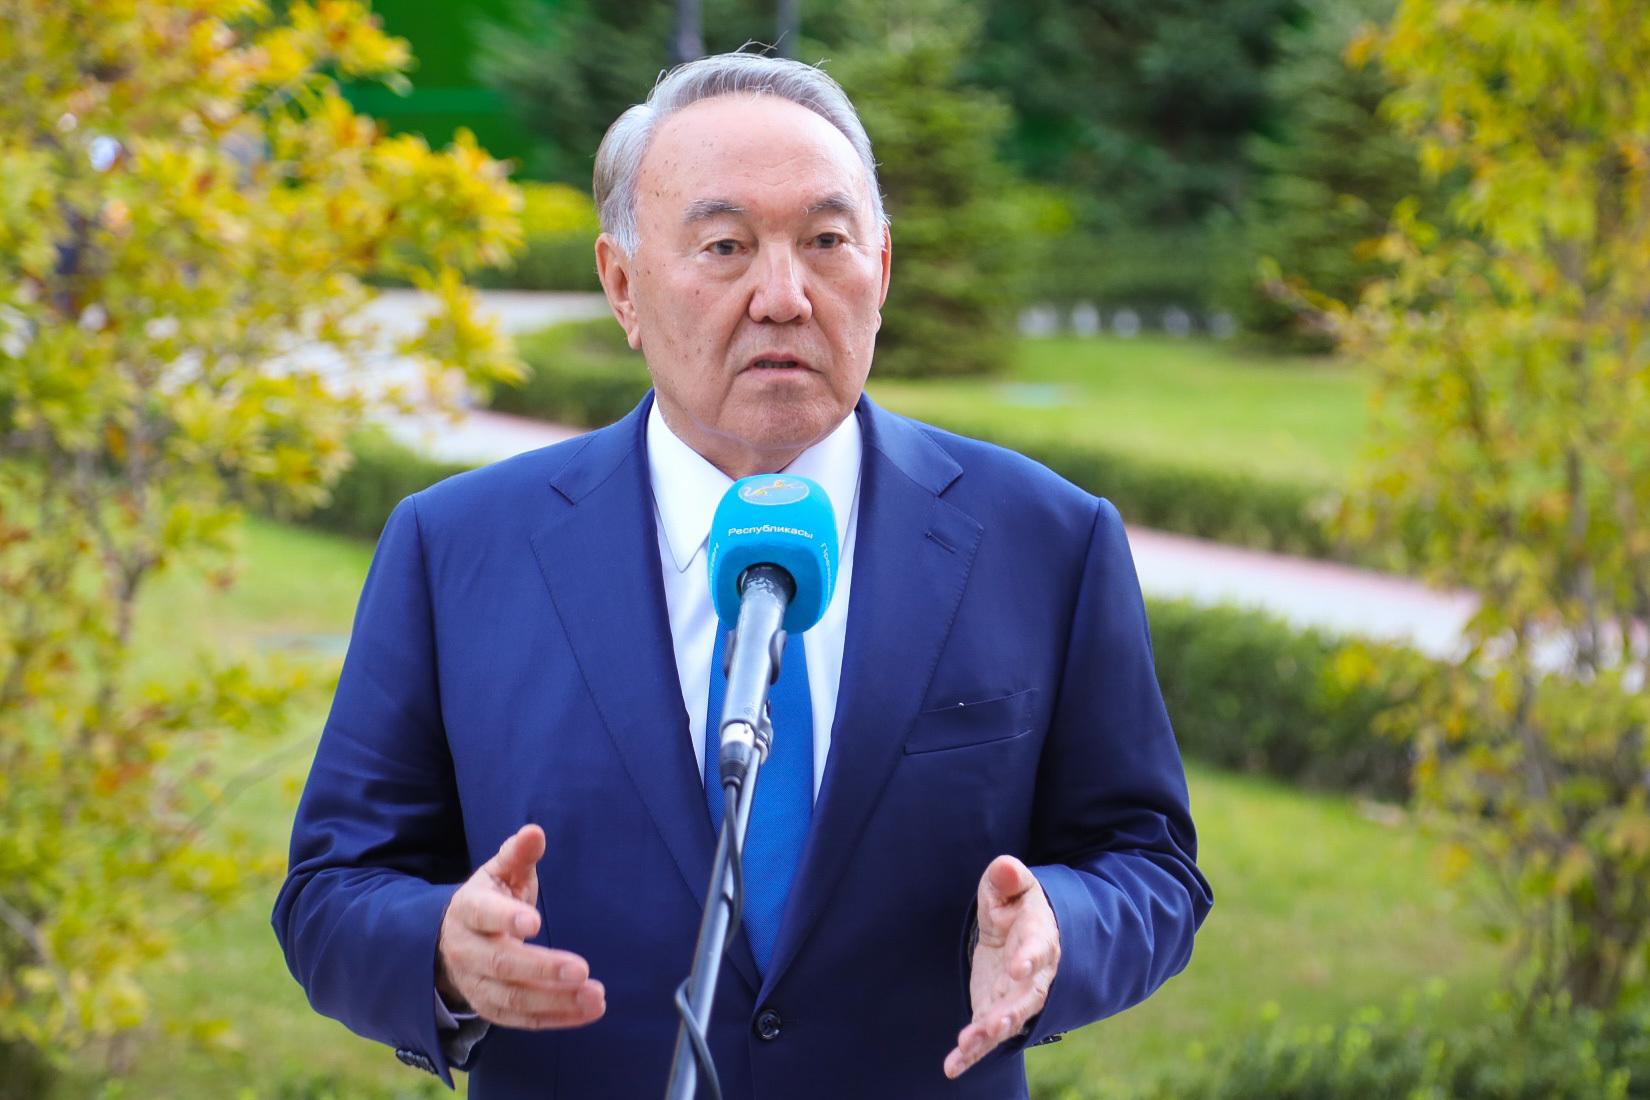 Назарбаев подписал указ о переходе на латиницу до 2025 года. Назарбаев подписал указ о переходе на латиницу до 2025 года